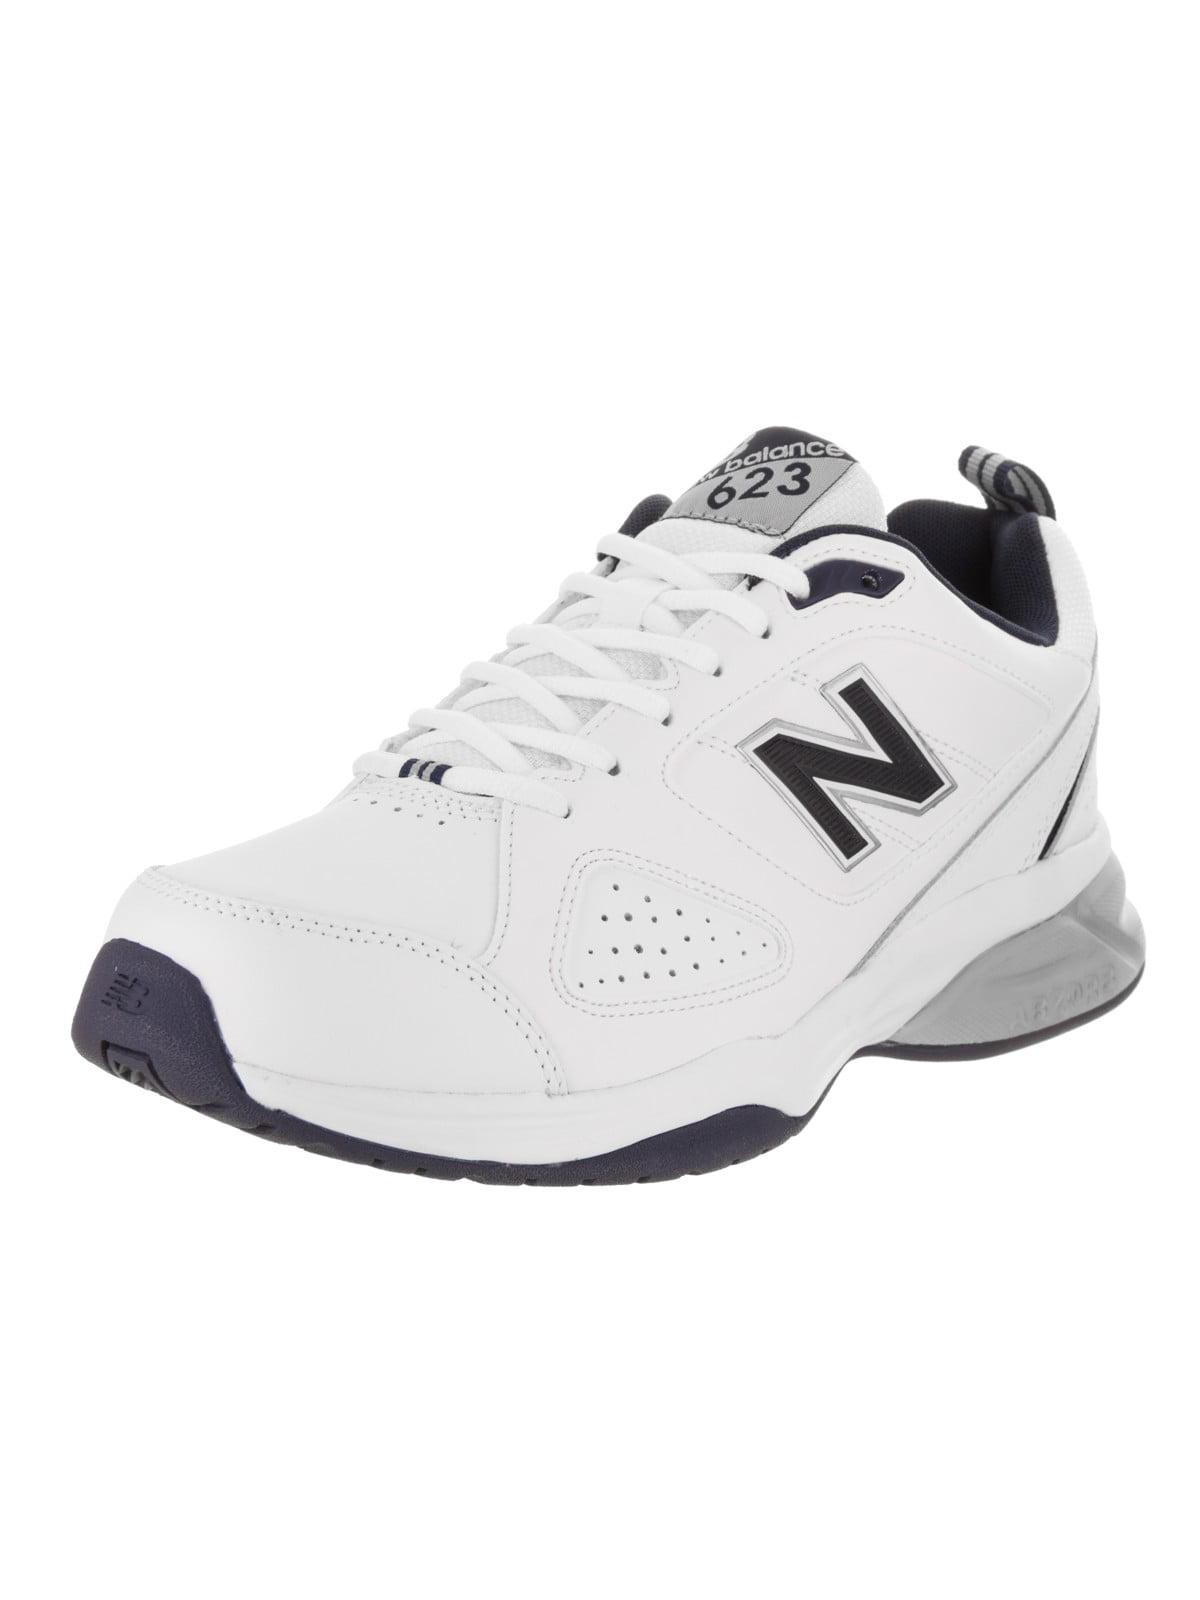 New Balance Men's MX623v3 Extra Wide 2E Training Shoe by New Balance